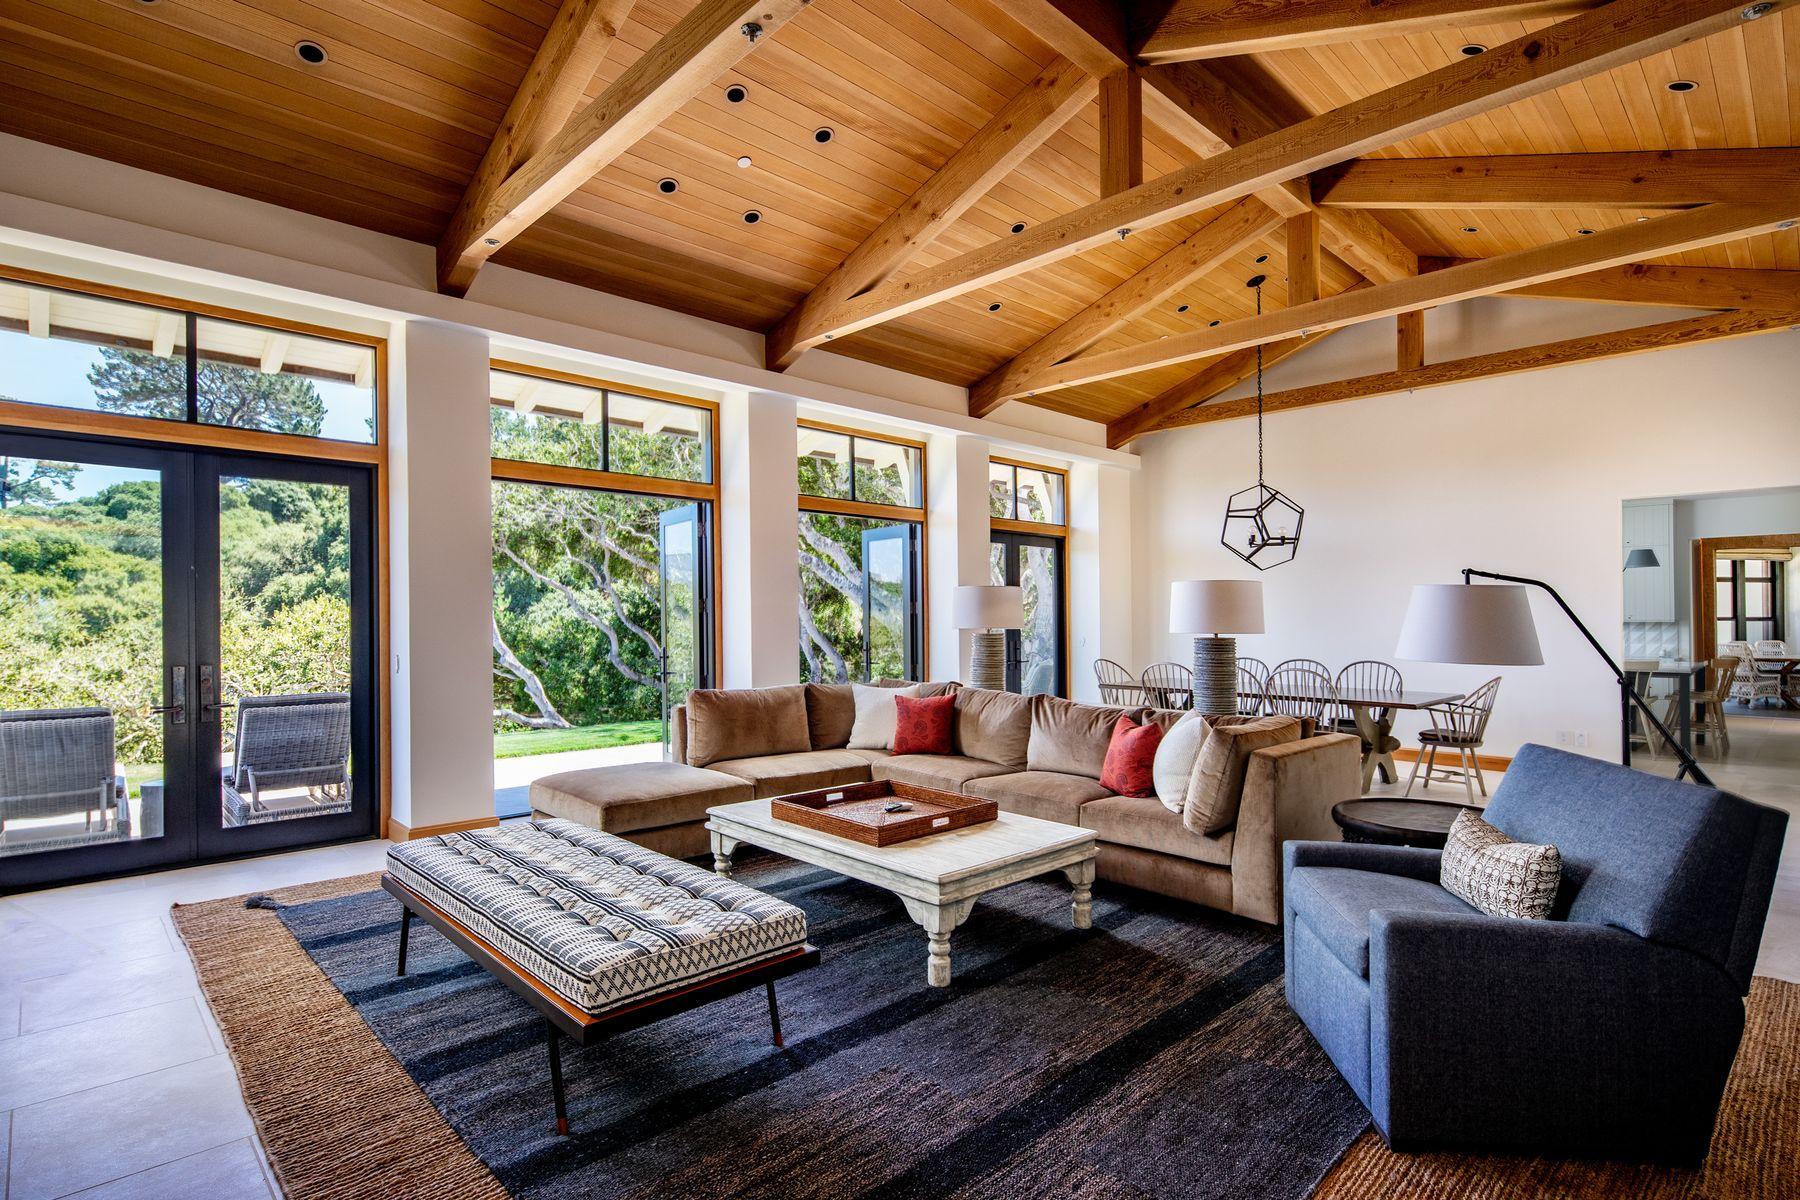 Single Family Homes for Sale at Modern Farmhouse 5493 Oak Trail Carmel, California 93923 United States